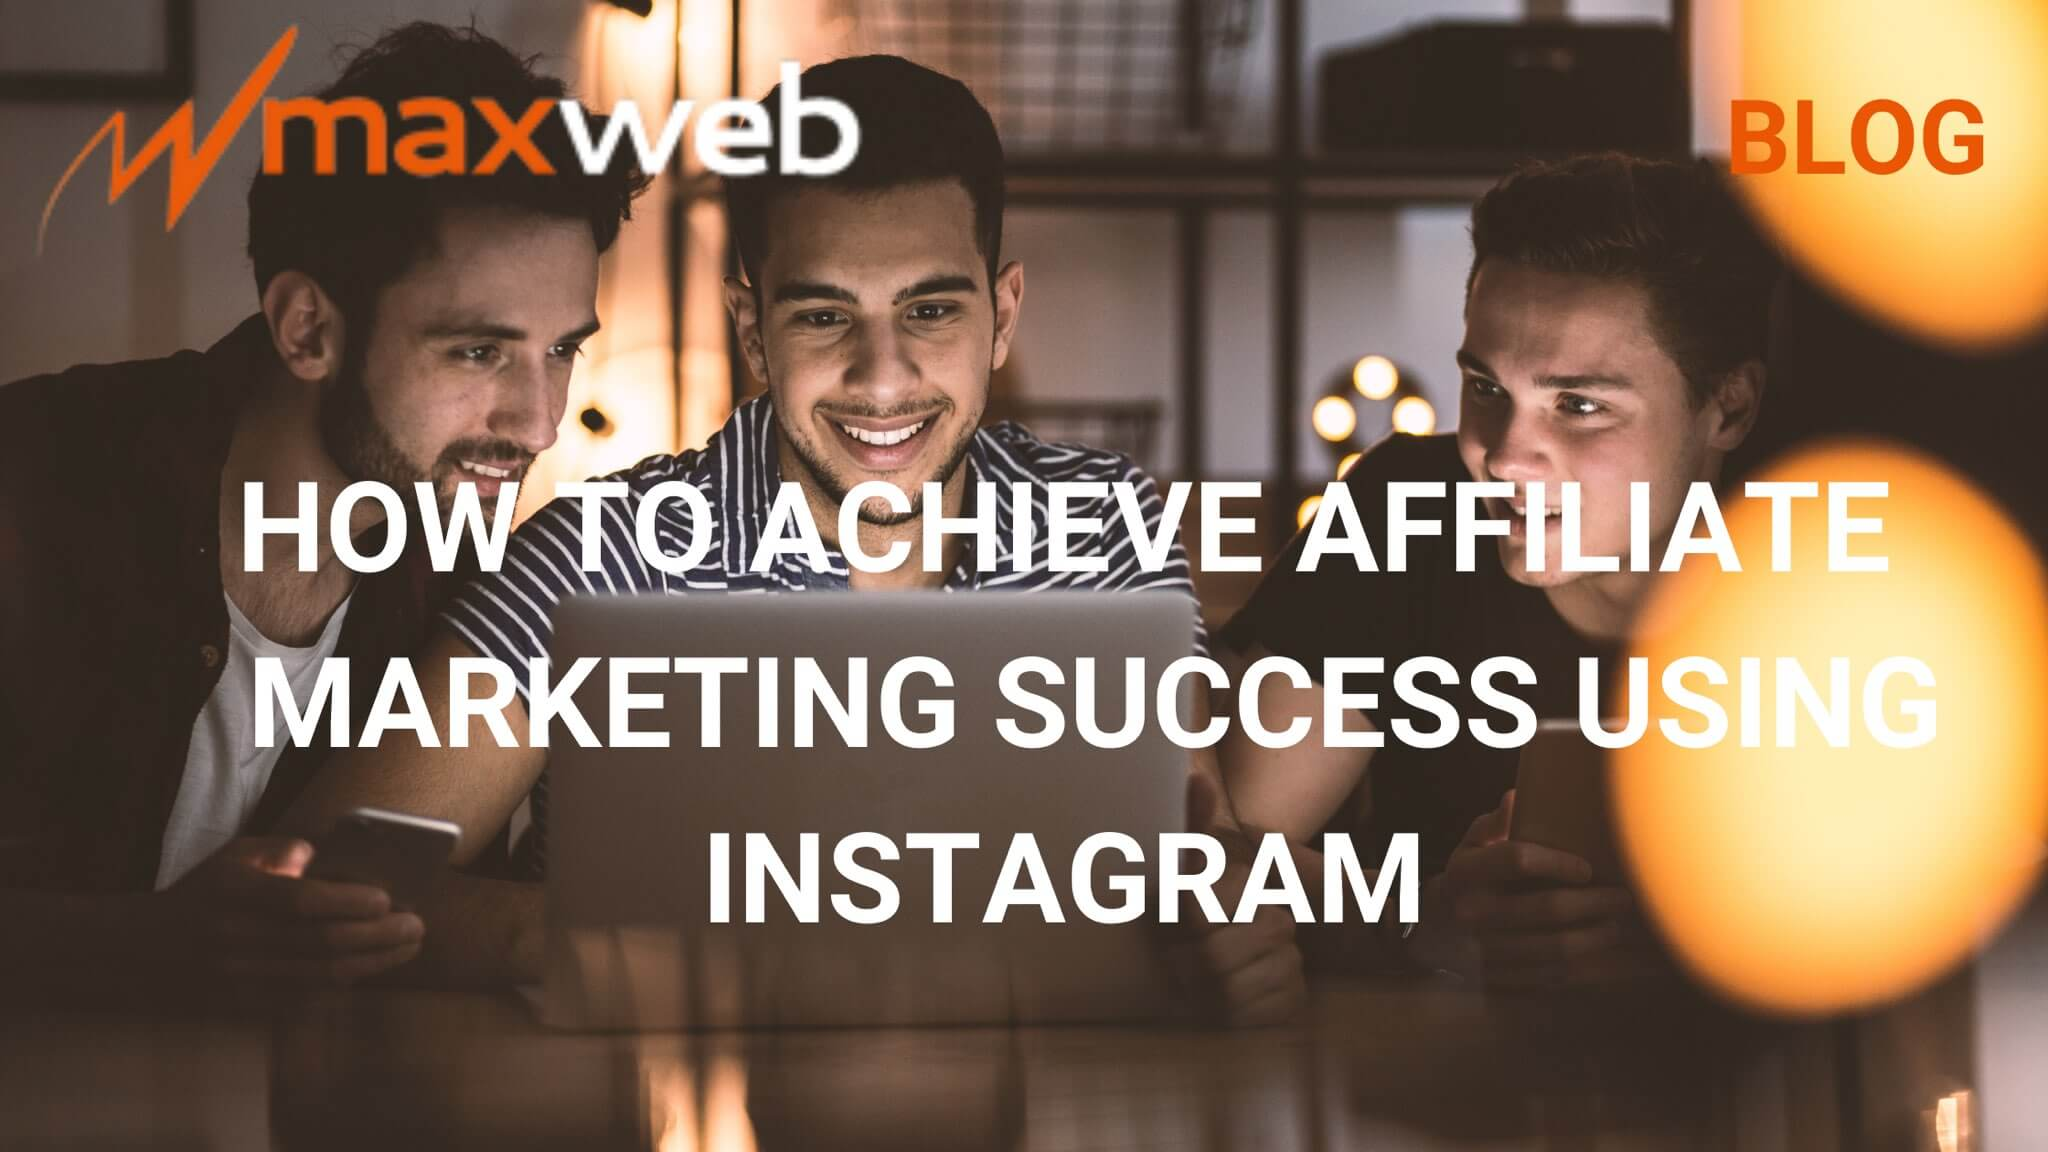 How to Achieve Affiliate Marketing Success Using Instagram